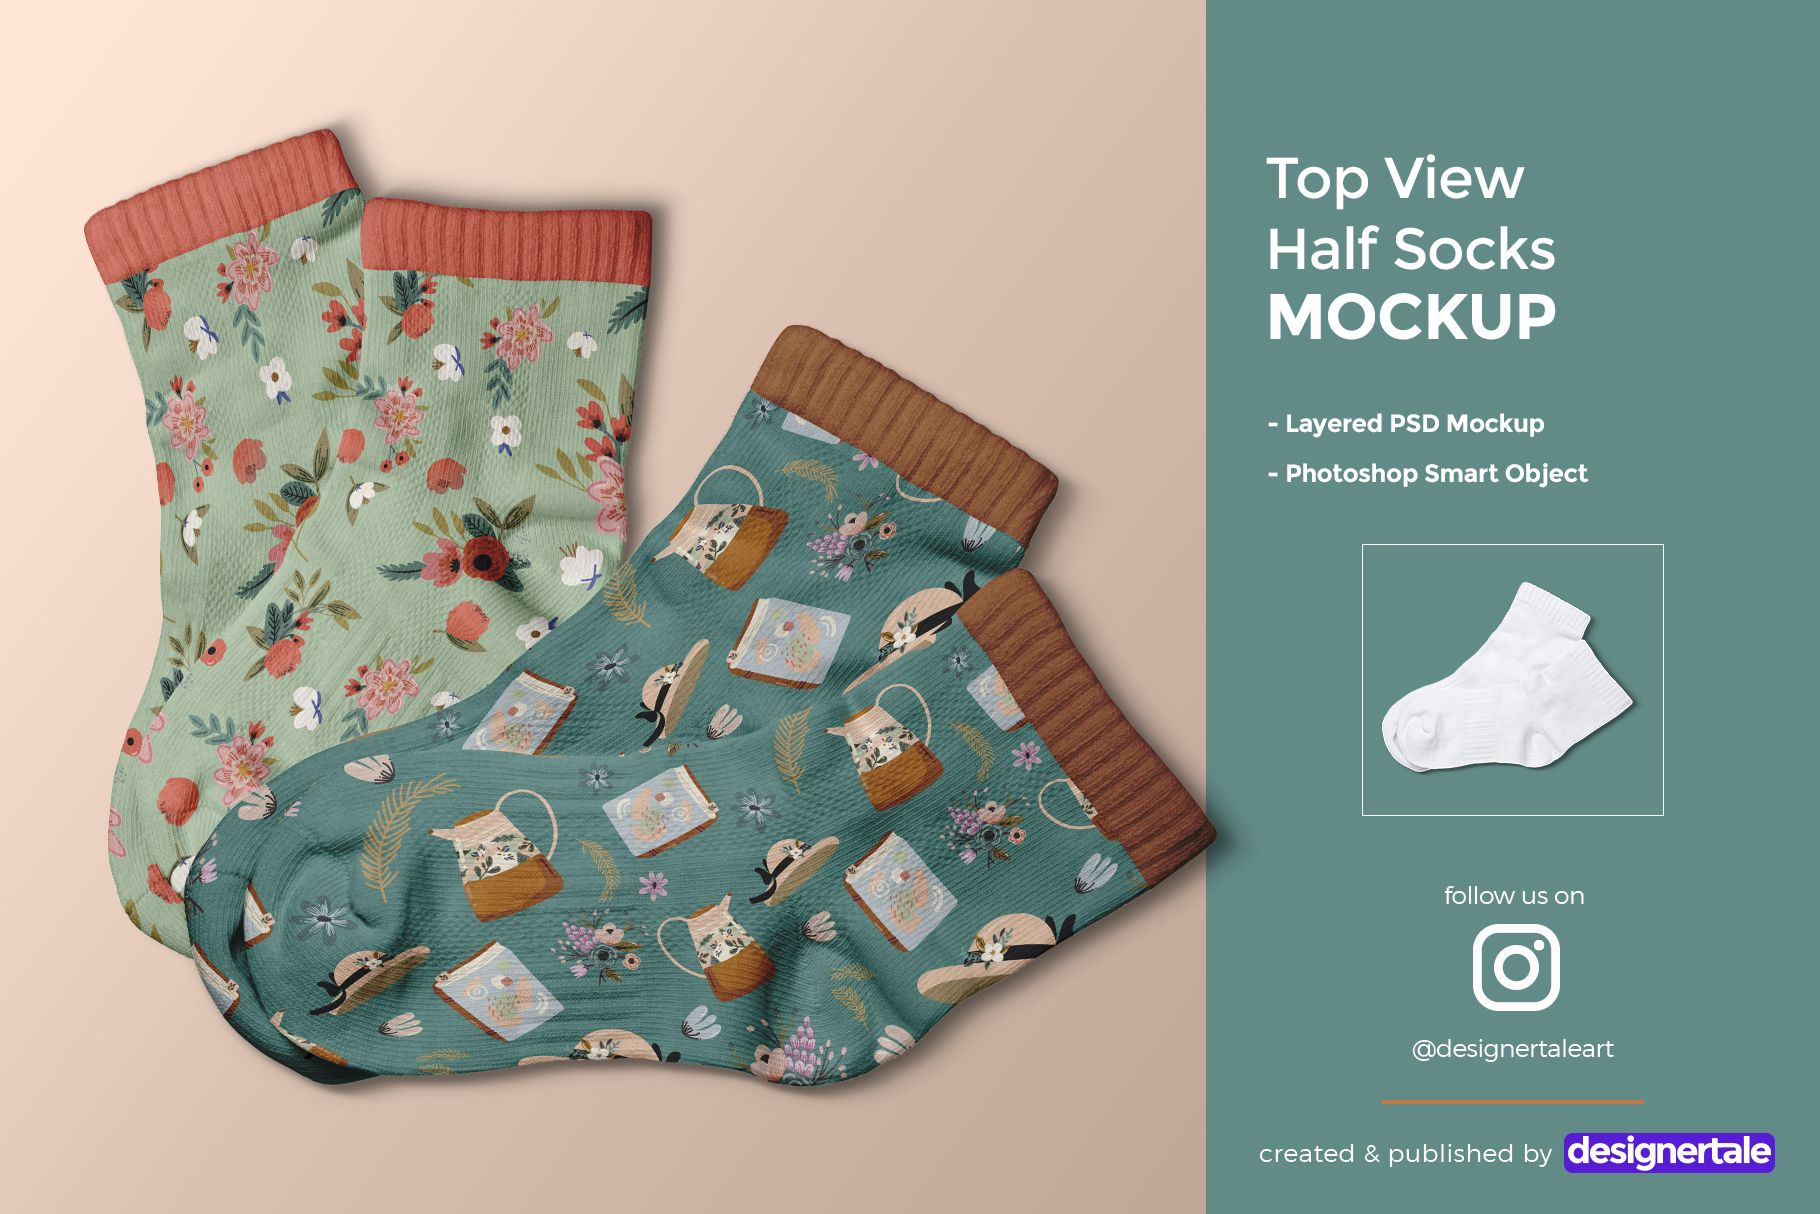 Download Top View Half Socks Mockup Designertale Half Socks Mockup Design Mockup